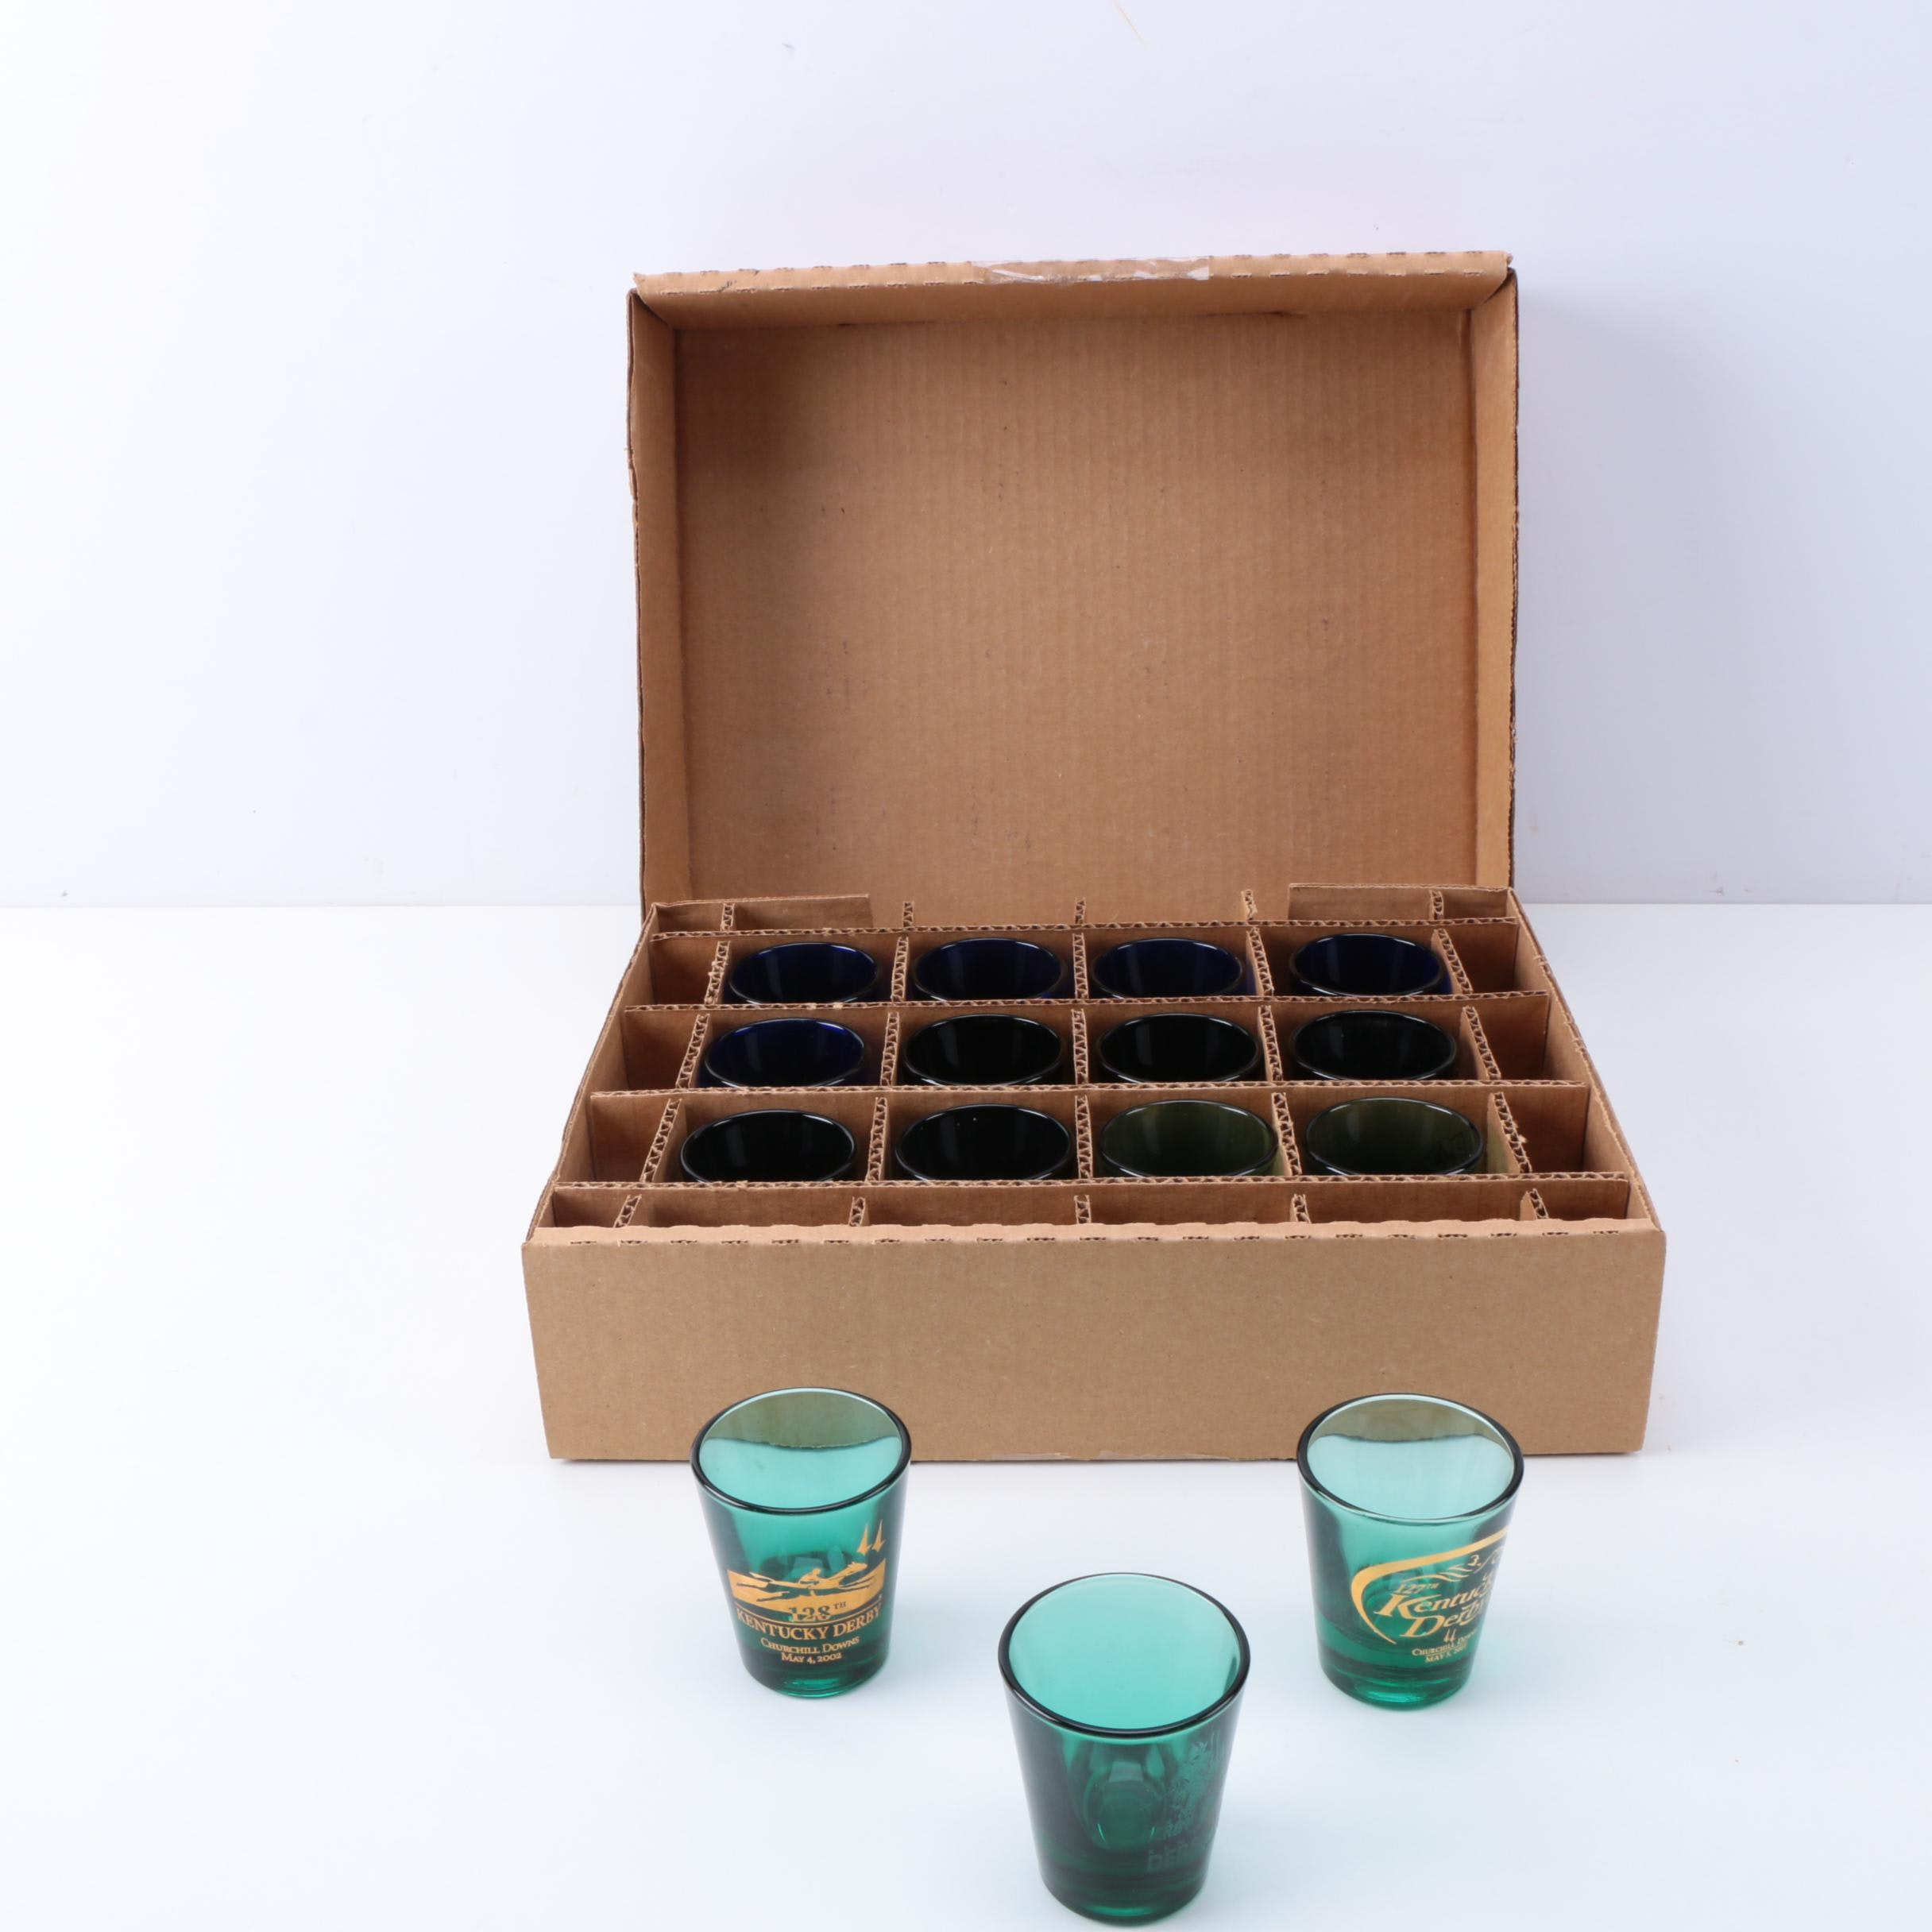 Kentucky Derby Commemorative Shotglasses